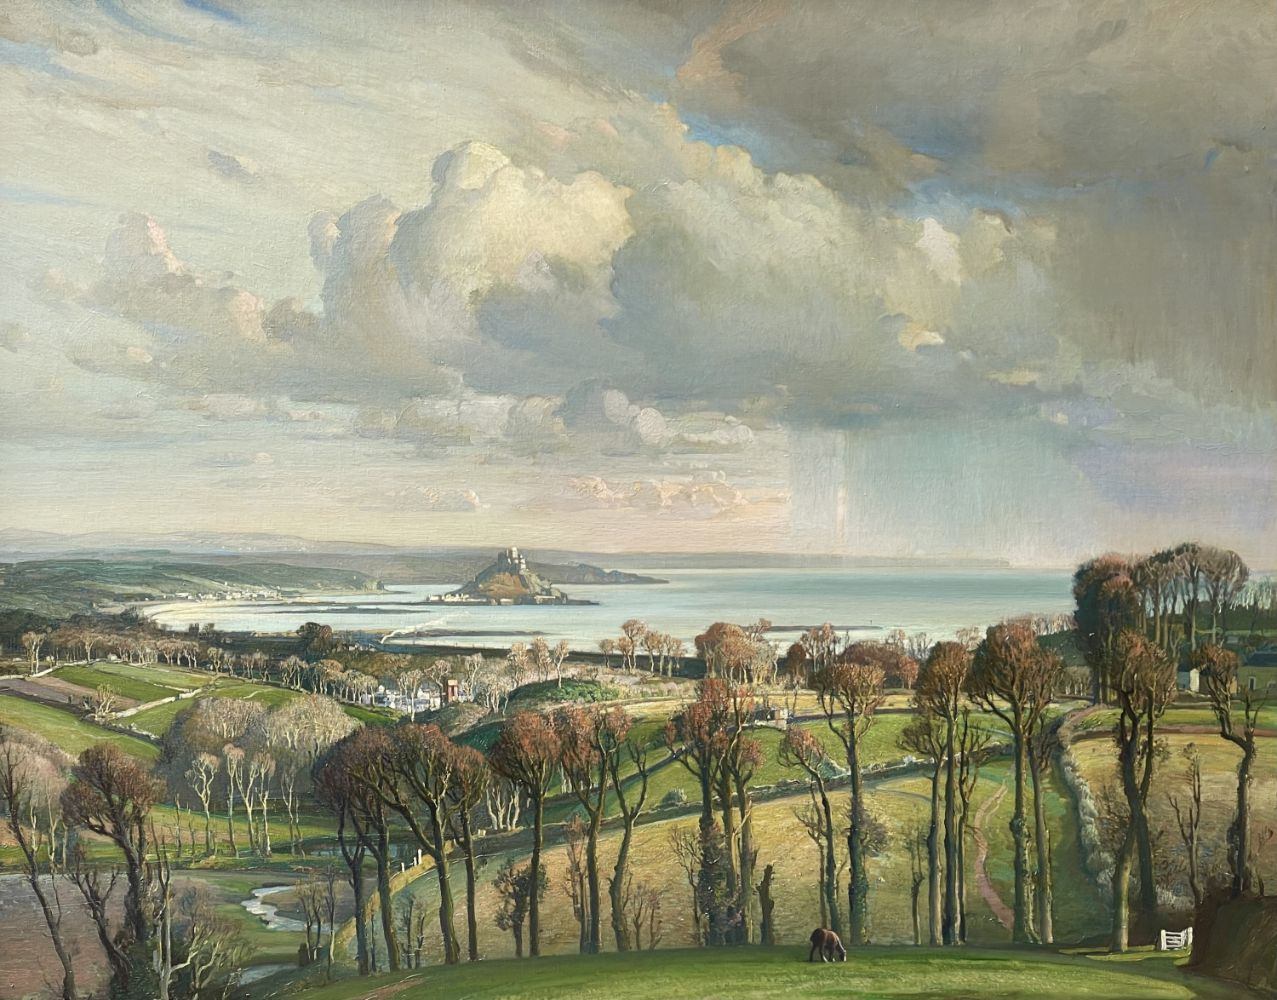 Cornish Art & Fine Art Sale - David Lay Auctions